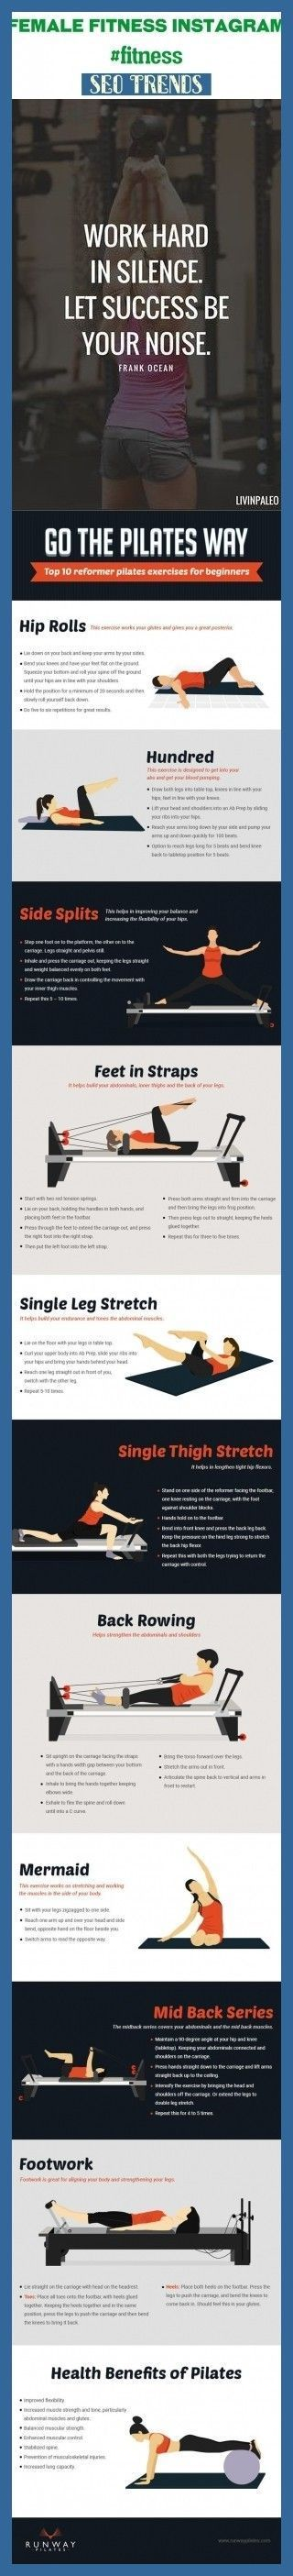 #fitness  #seotips  #seo  #health. female fitness motivati fitnees quotes #fitness #instagram  Femal...